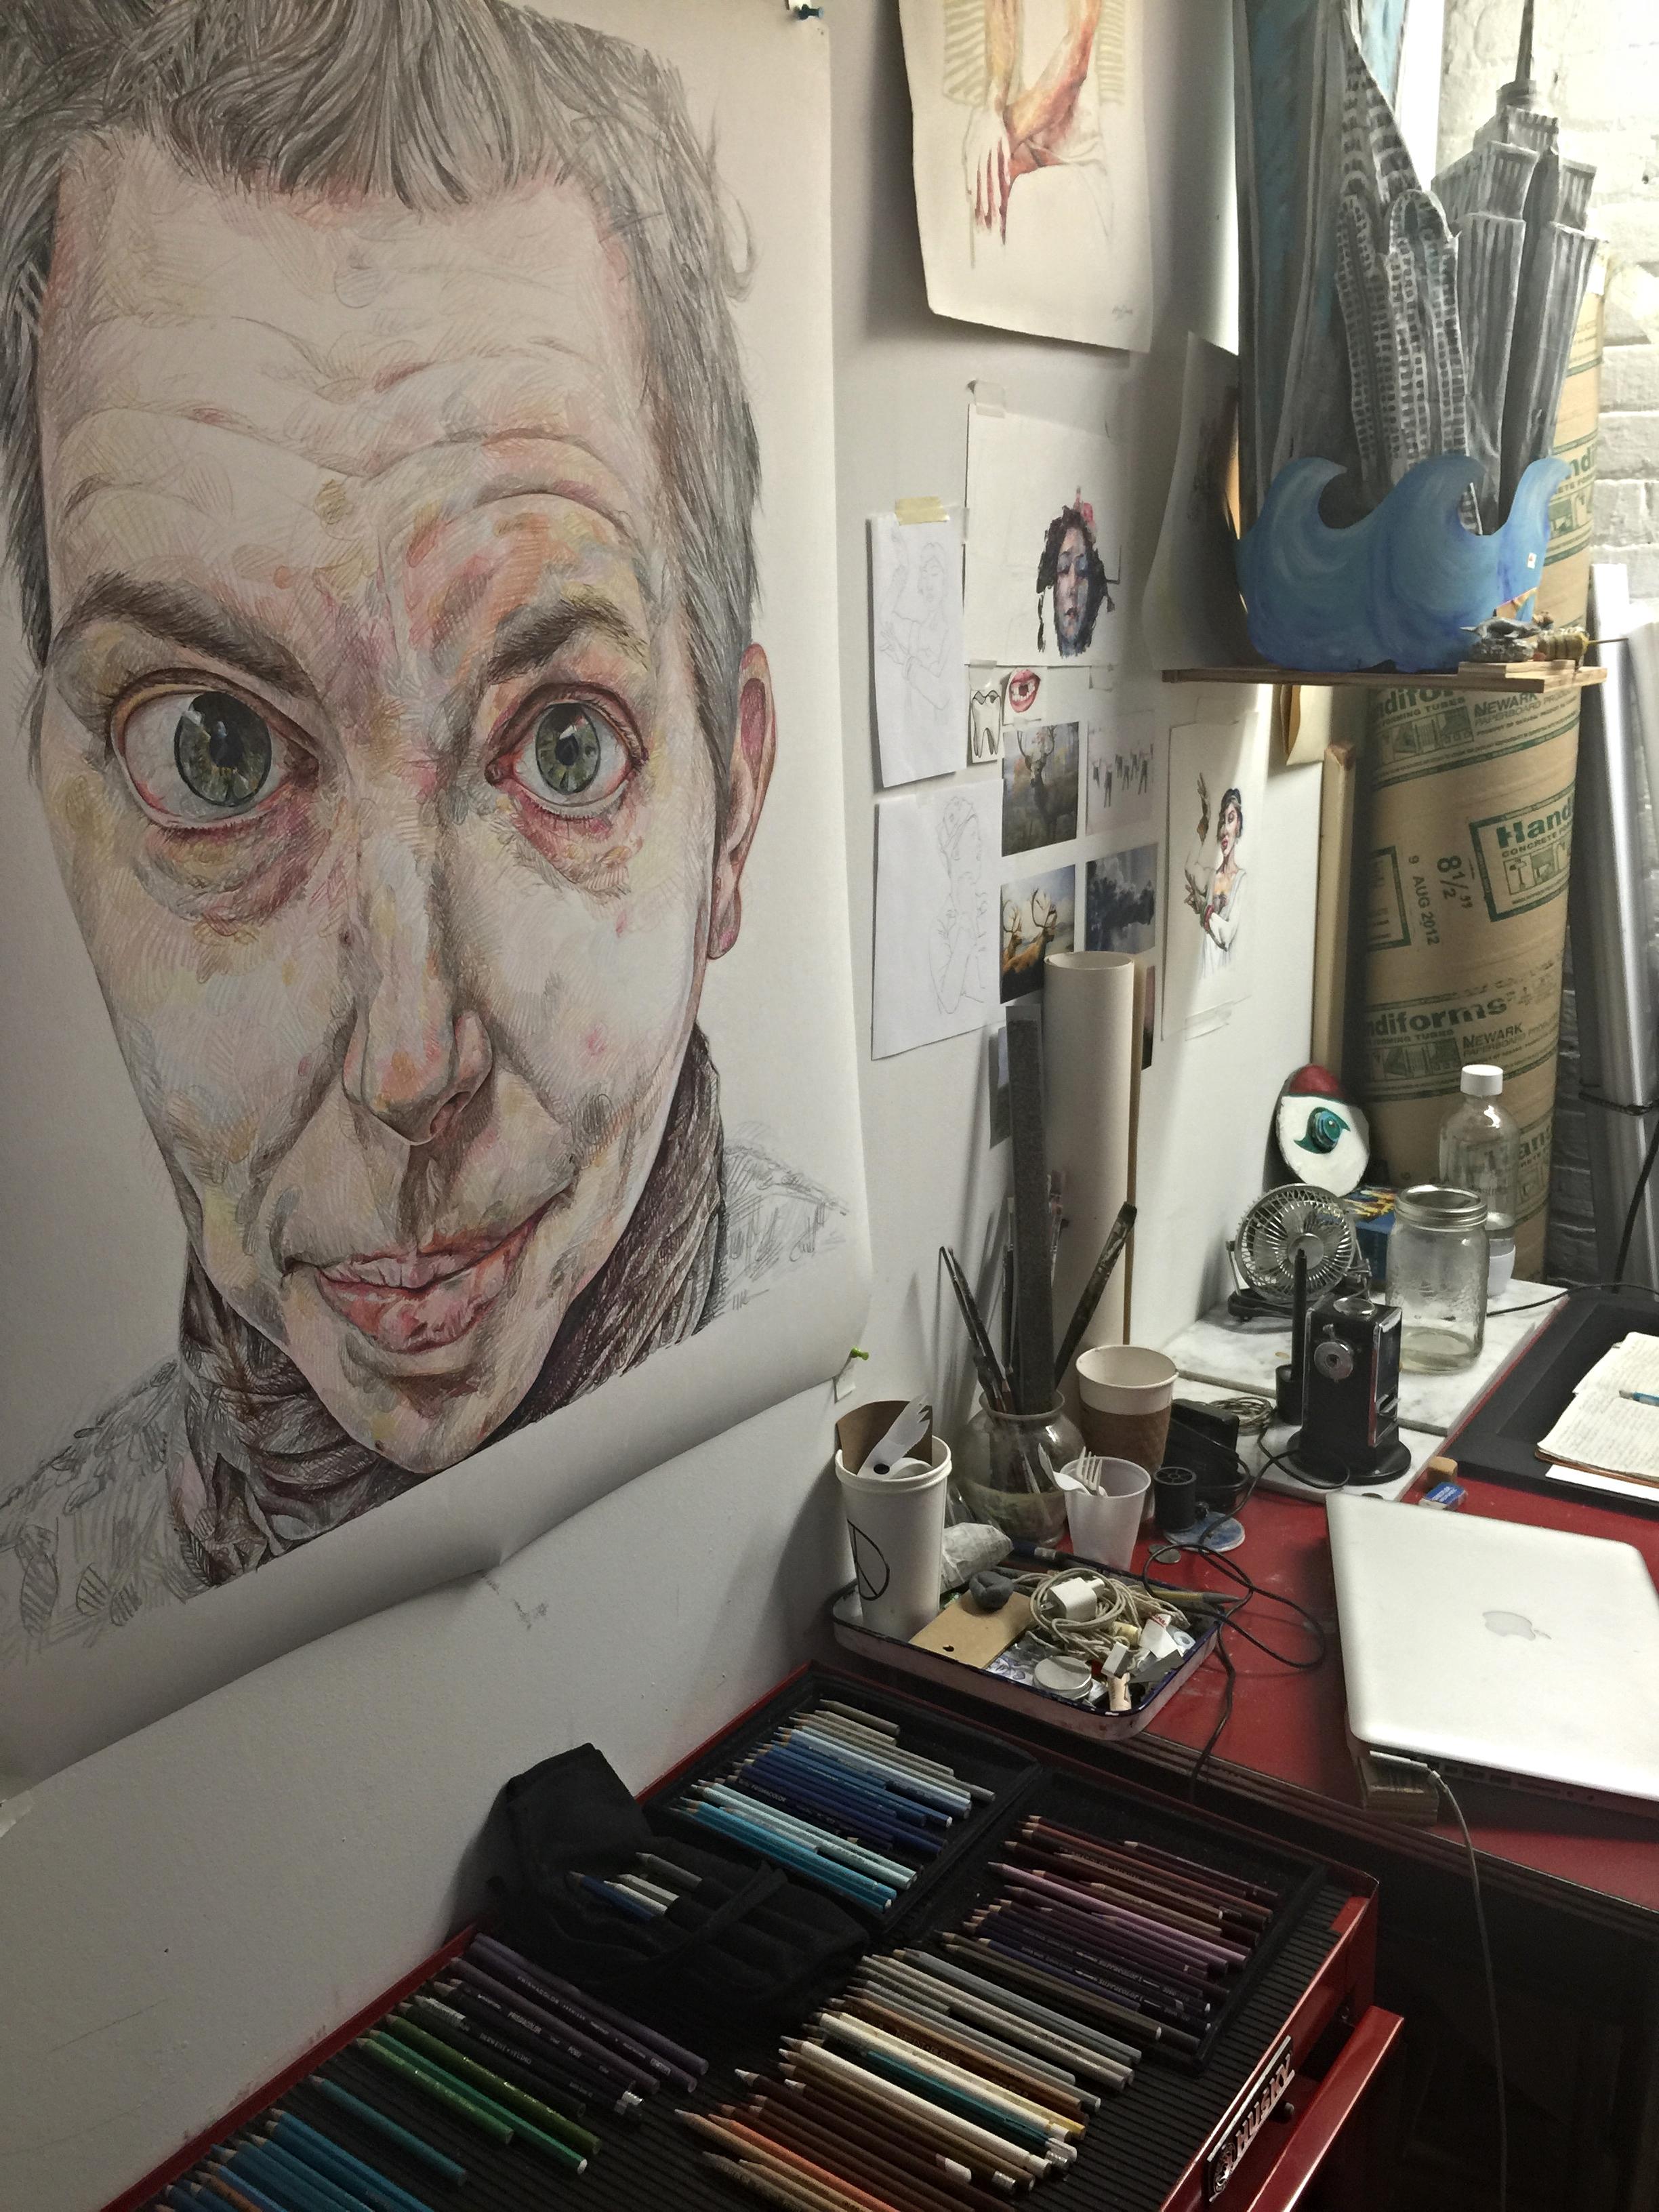 A shot captured inside Maya Seuss's studio space in the Gowanus neighbourhood of Brooklyn.